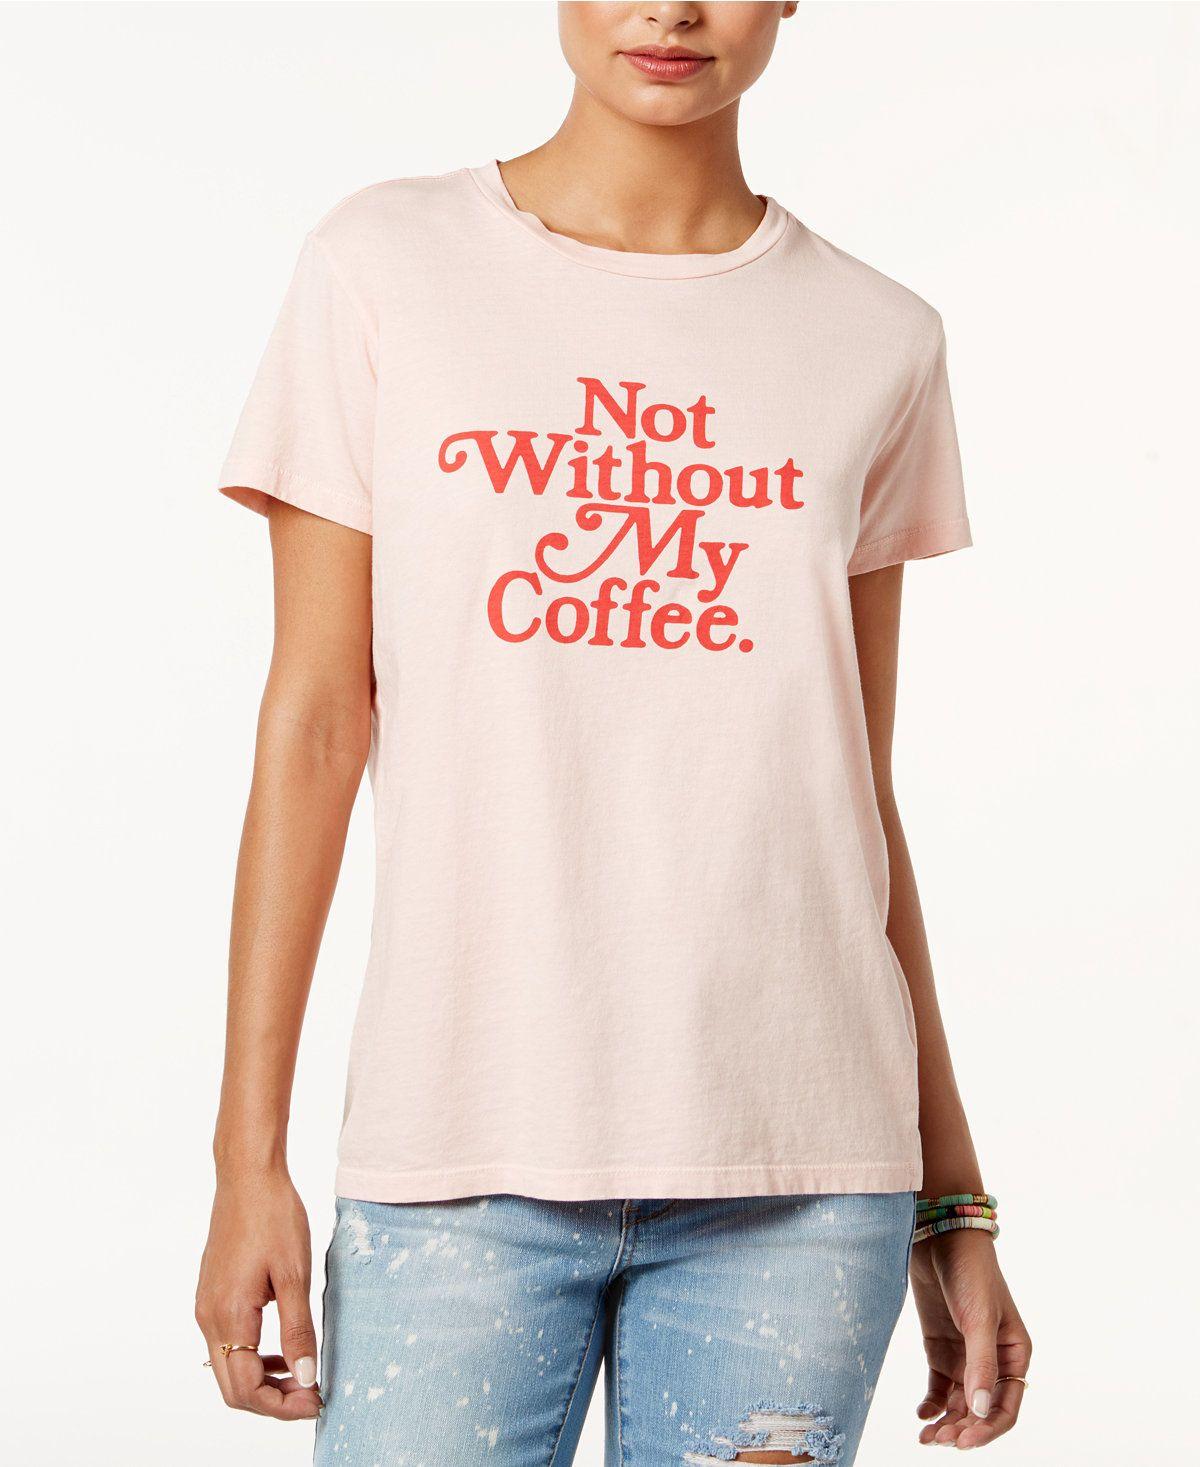 905ede7ffe18c Macys Womens White T Shirts - BCD Tofu House